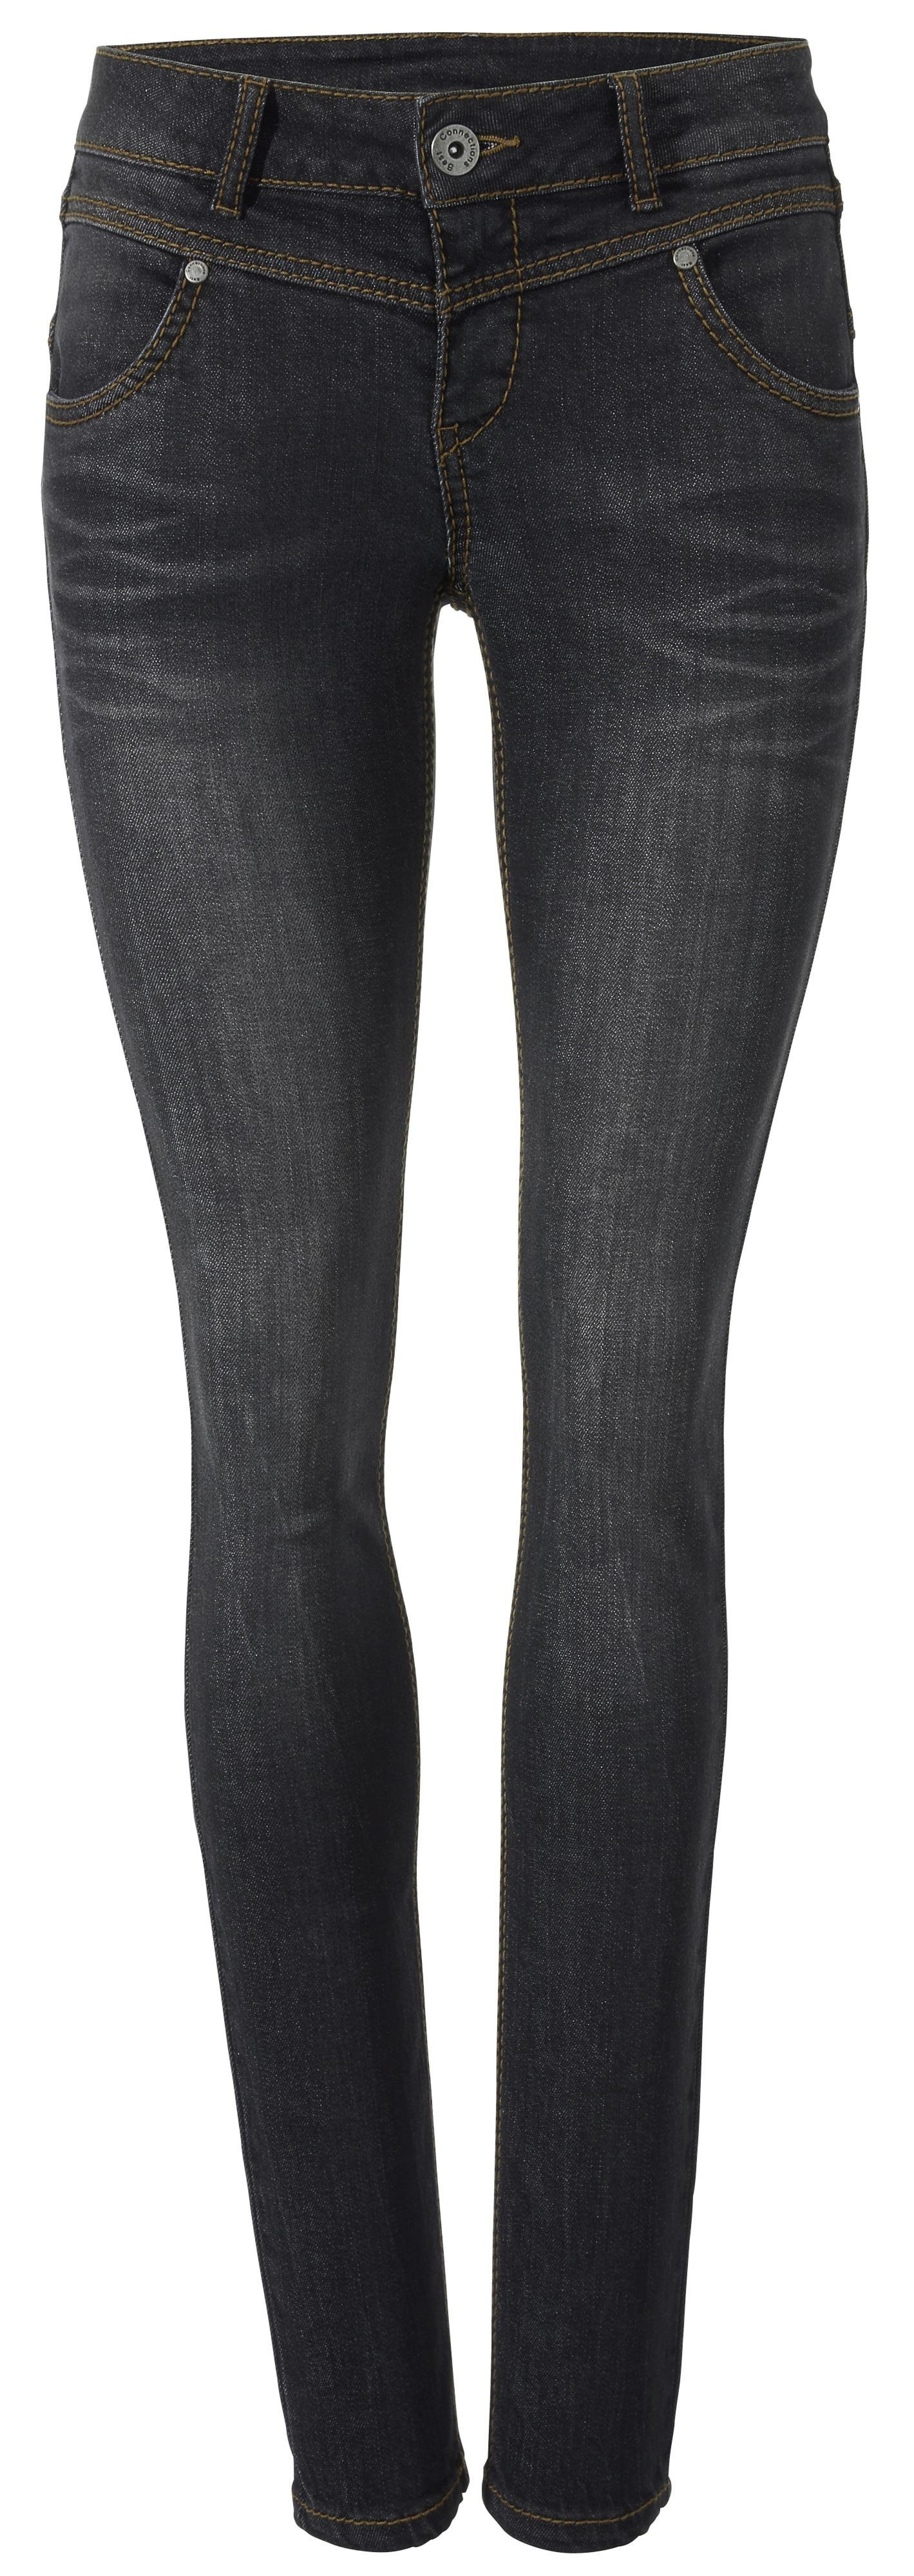 LINEA TESINI by Heine Skinny-jeans voordelig en veilig online kopen